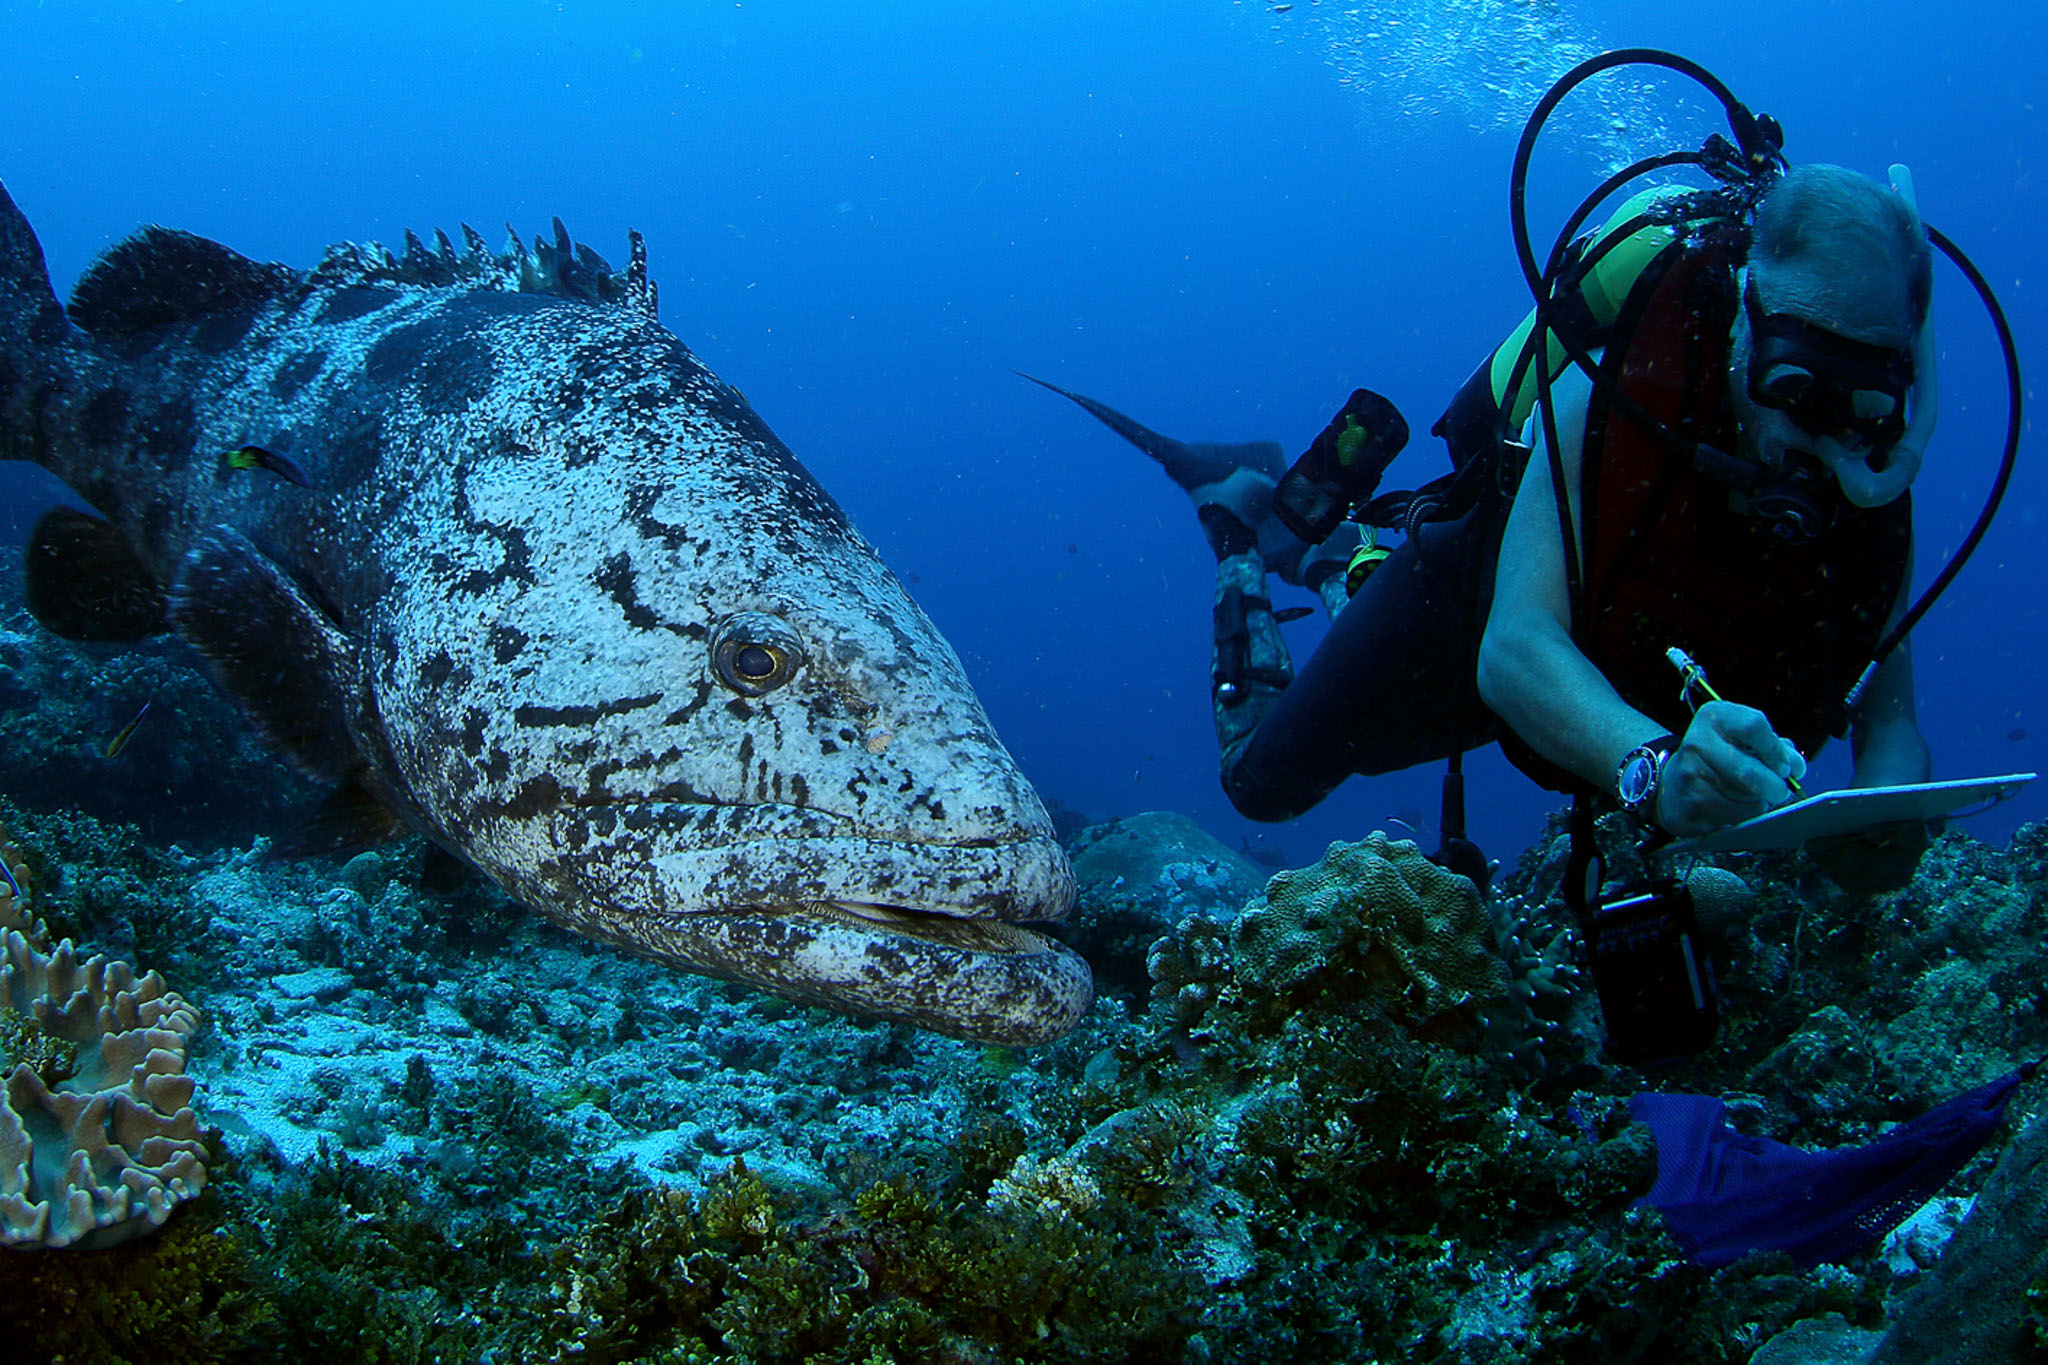 Seychelles Designates 30% of its EEZ as Marine Protected Area